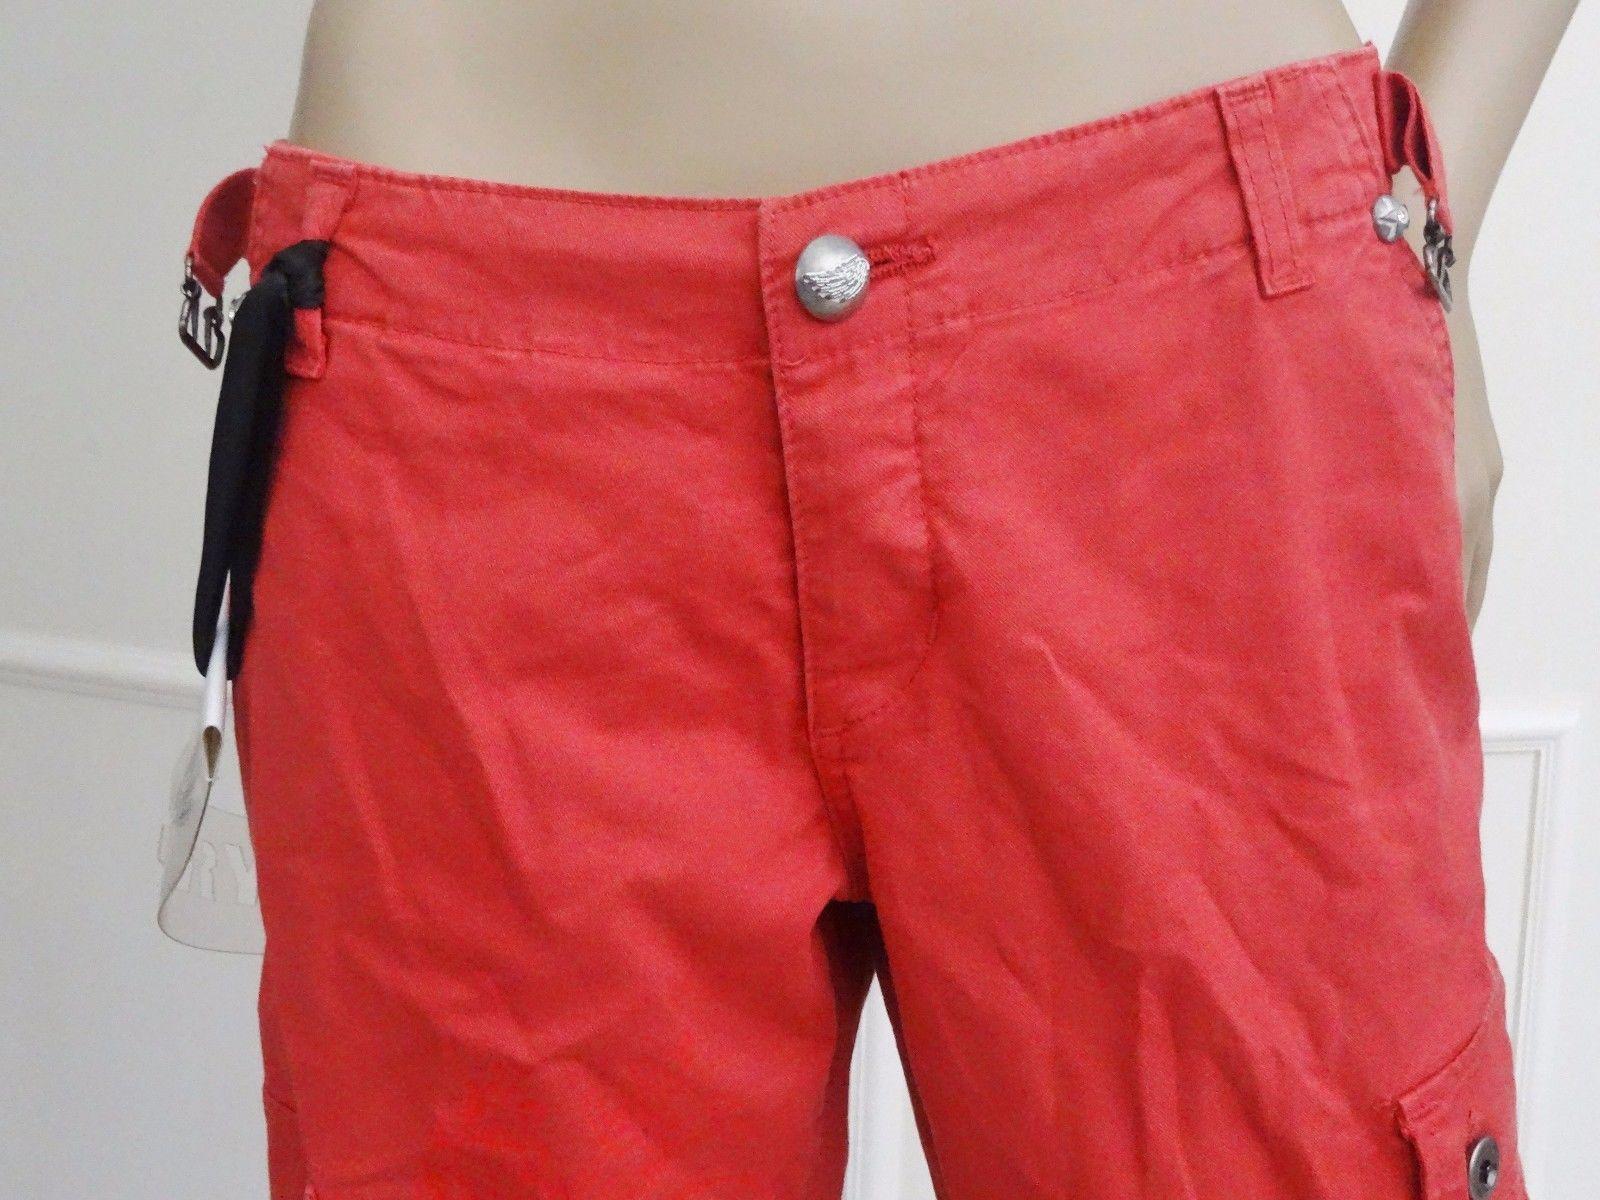 New Crystal Rock Christian Audigier Hippie Wide Leg Jeans Pants Sz 27 4 Red